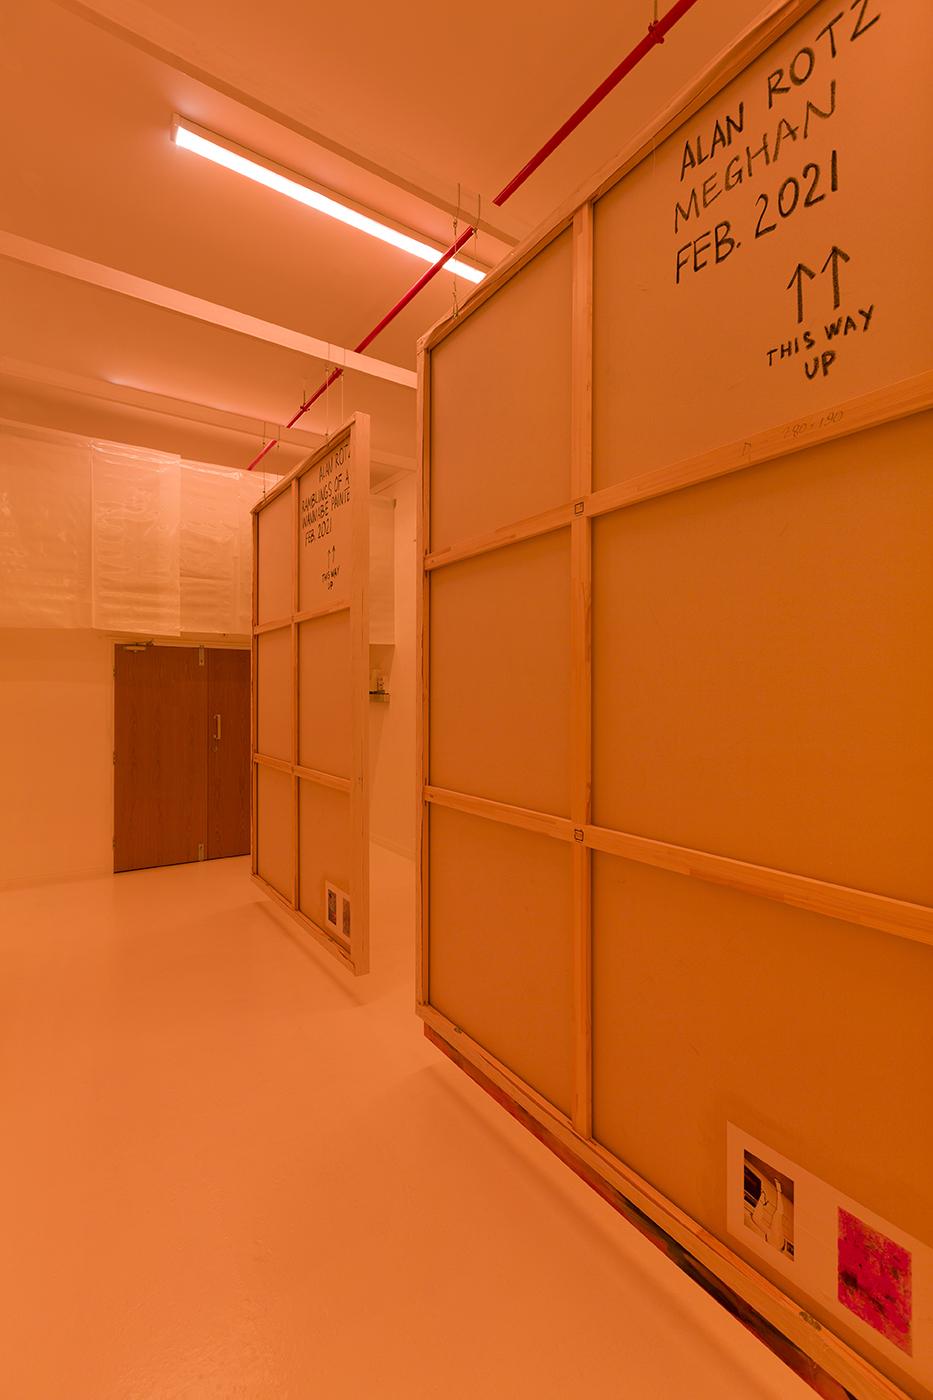 Installation view, Alan Rotz, MIRROR, 2021, Heteronymous Painters, © Alan Rotz. Photo: Vladimir Umanetz.